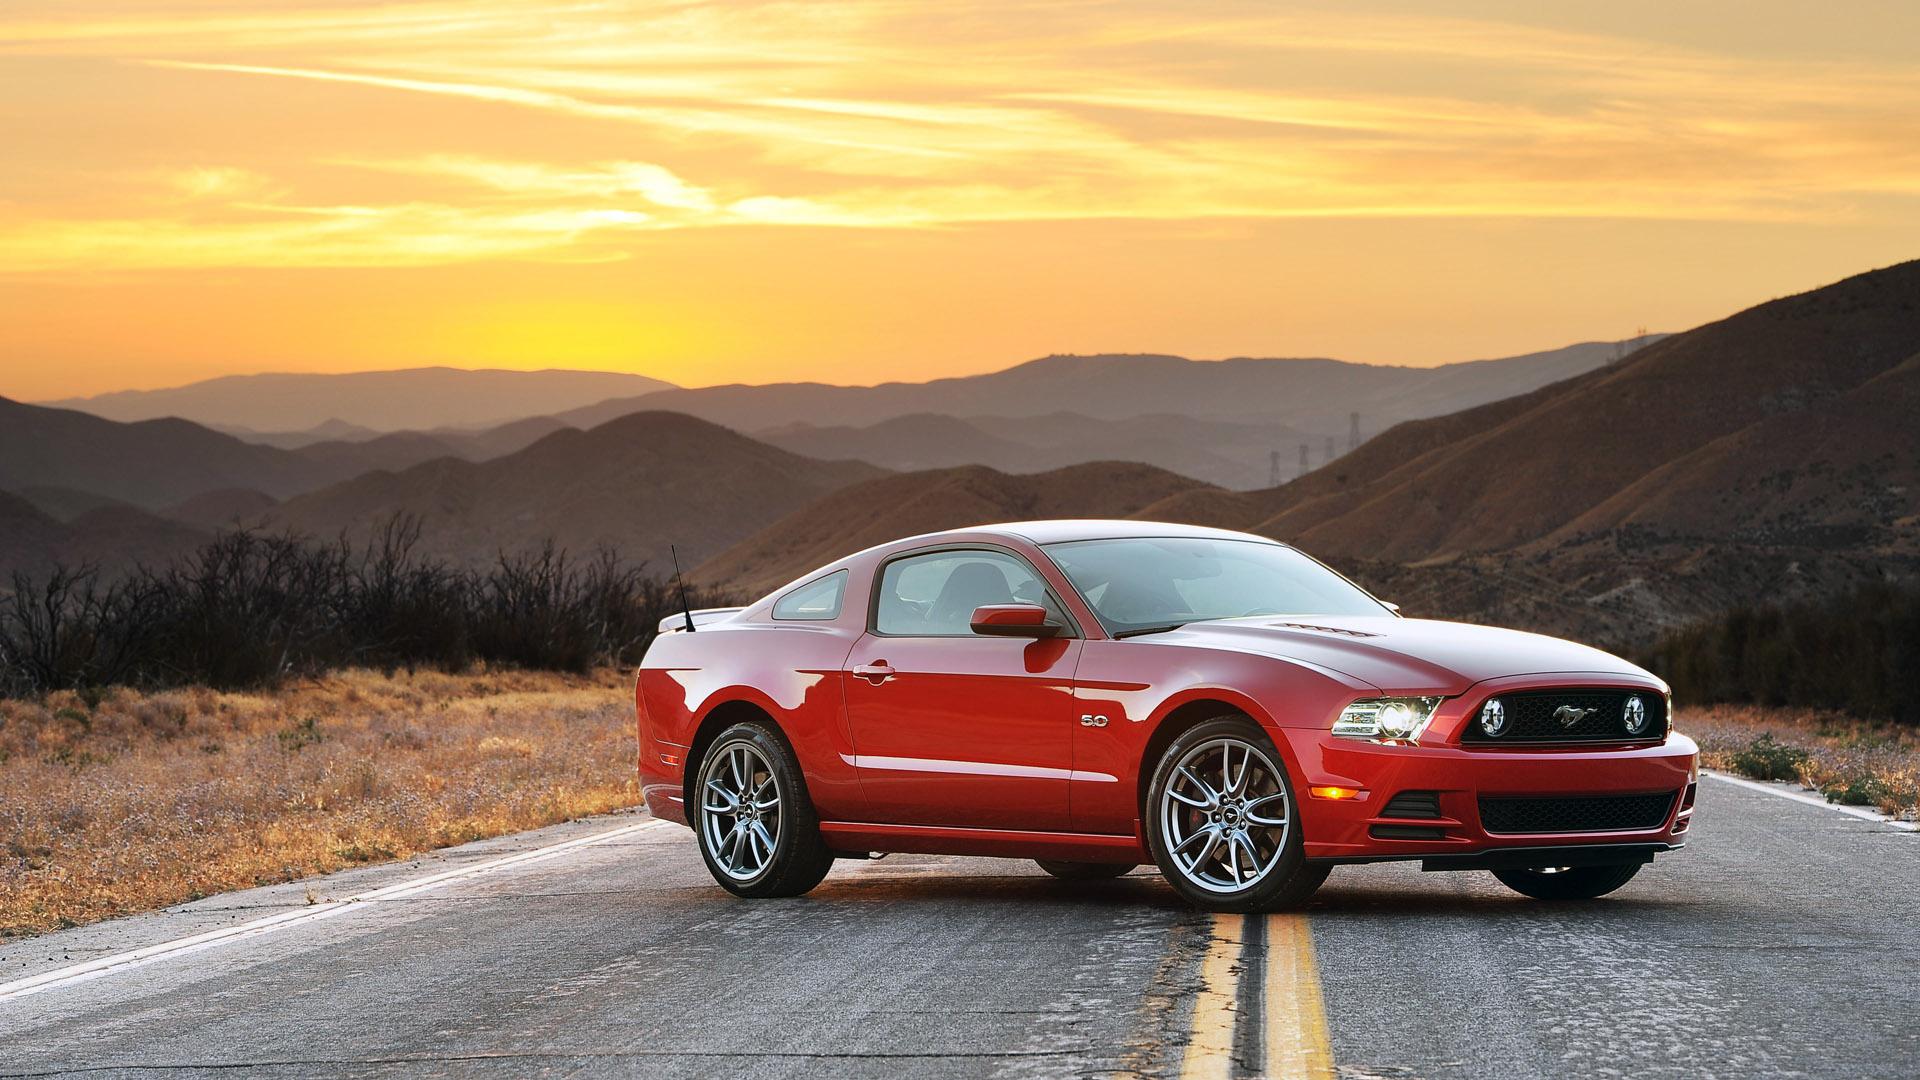 Ford Mustang Forum >> Free Download Mustang Desktop Wallpaper The Mustang Source